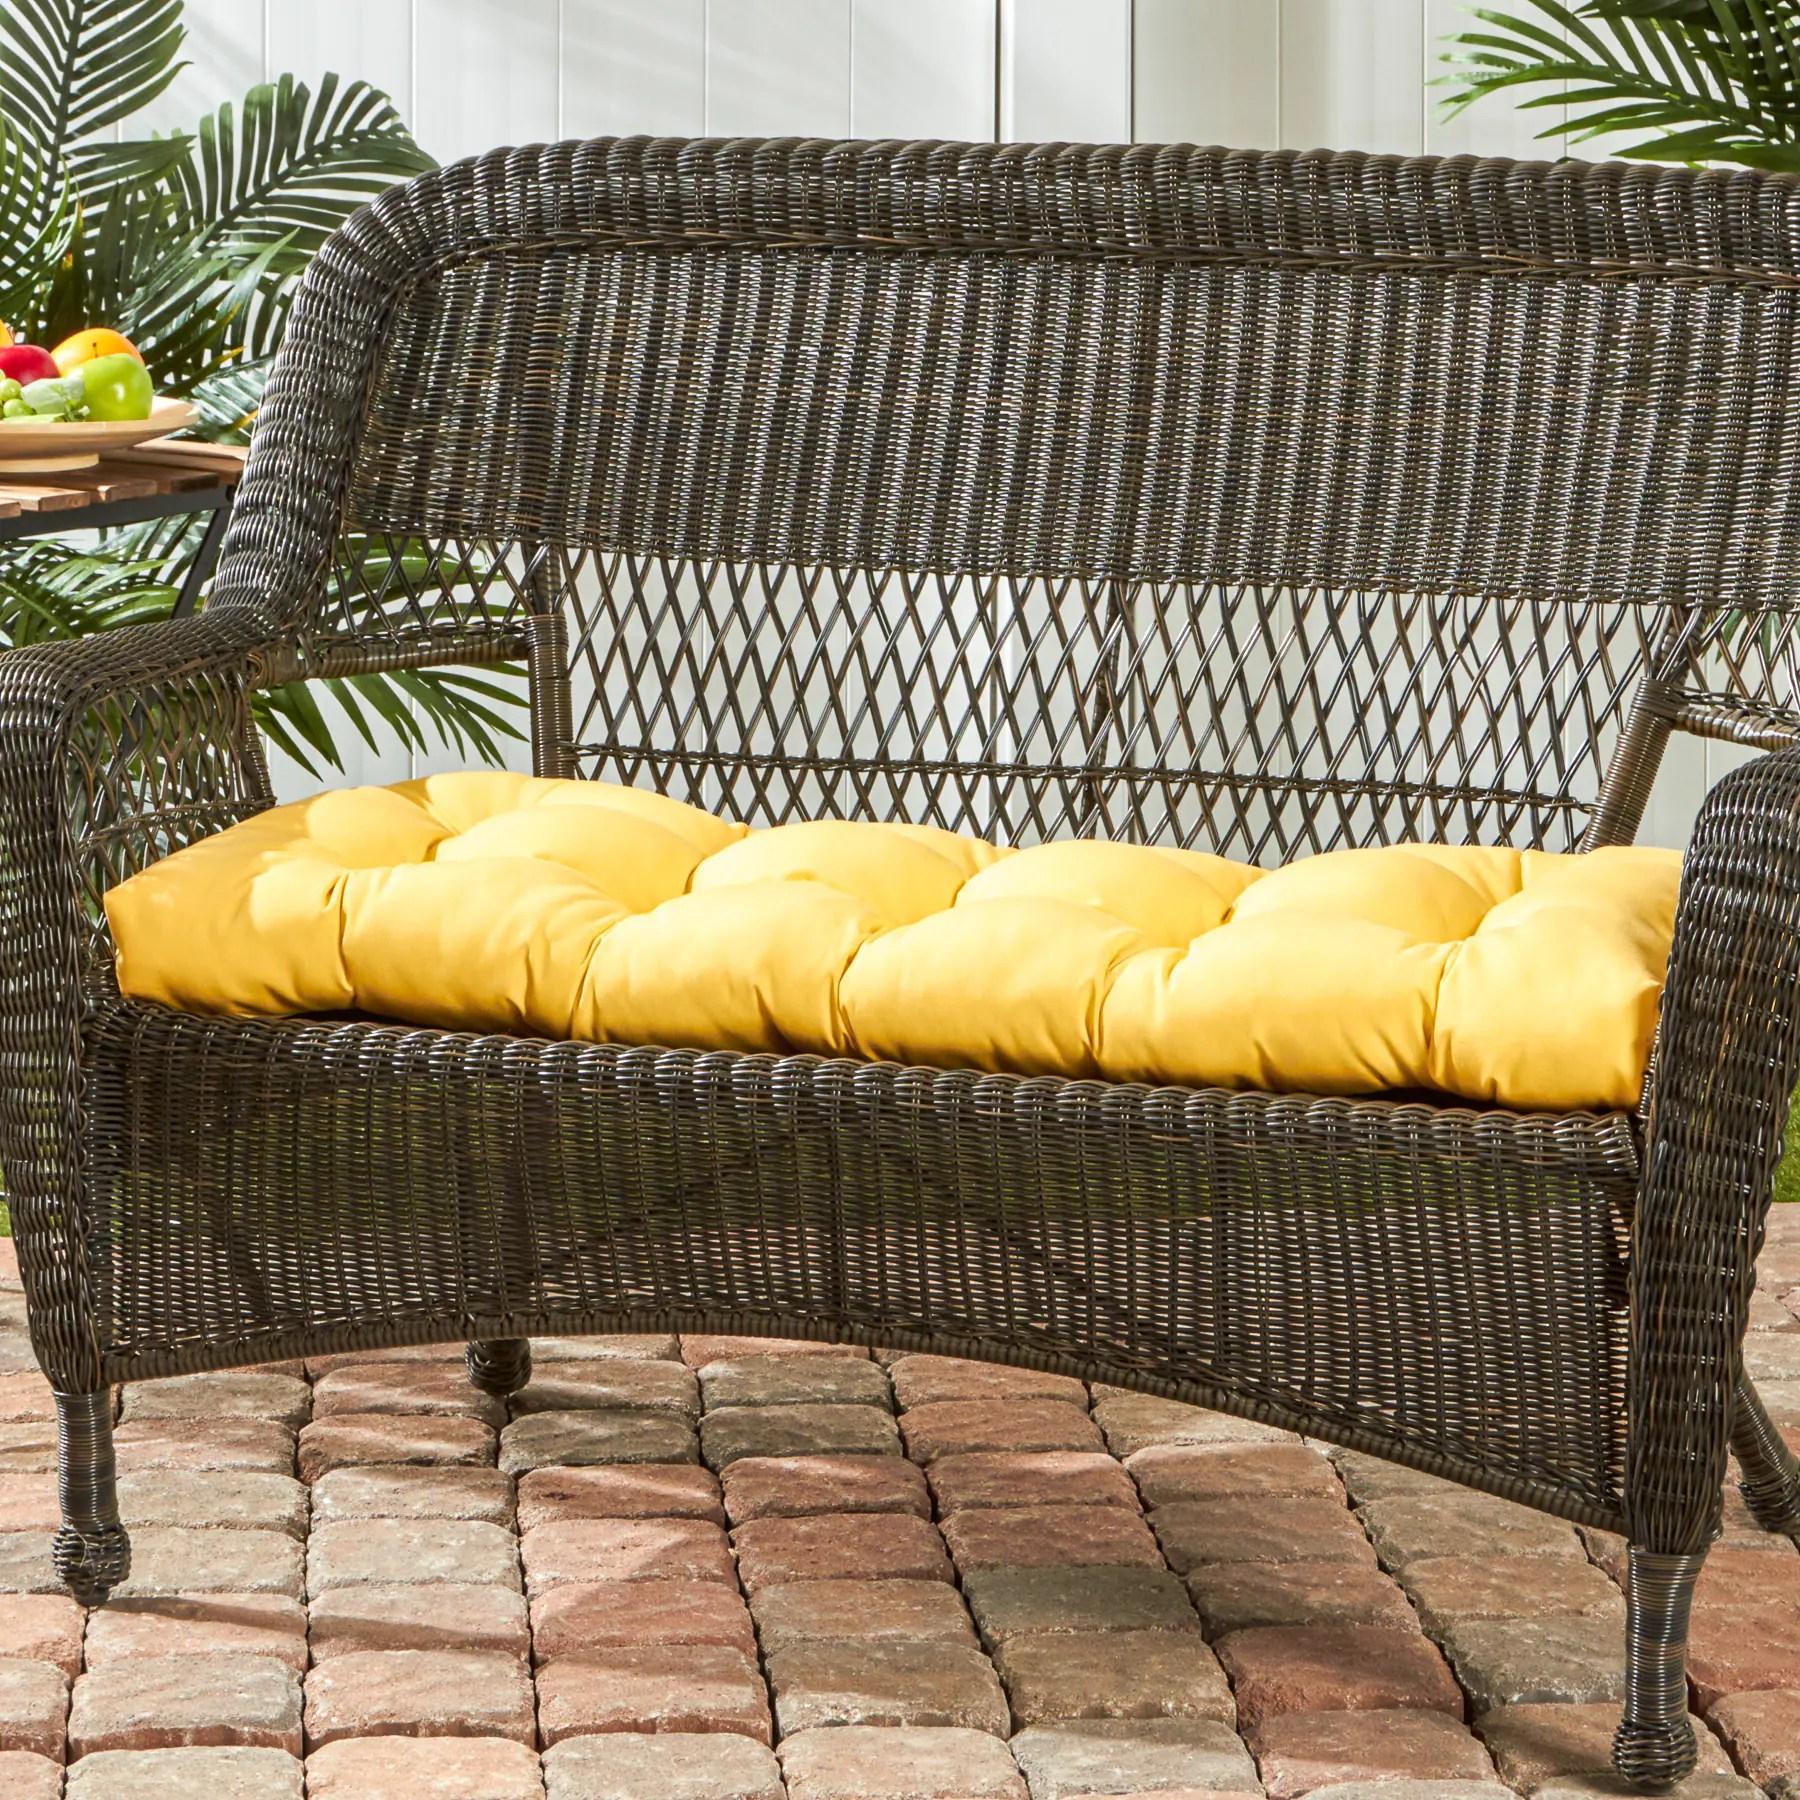 Shop Sunbrella Outdoor Swing Bench Cushion Free